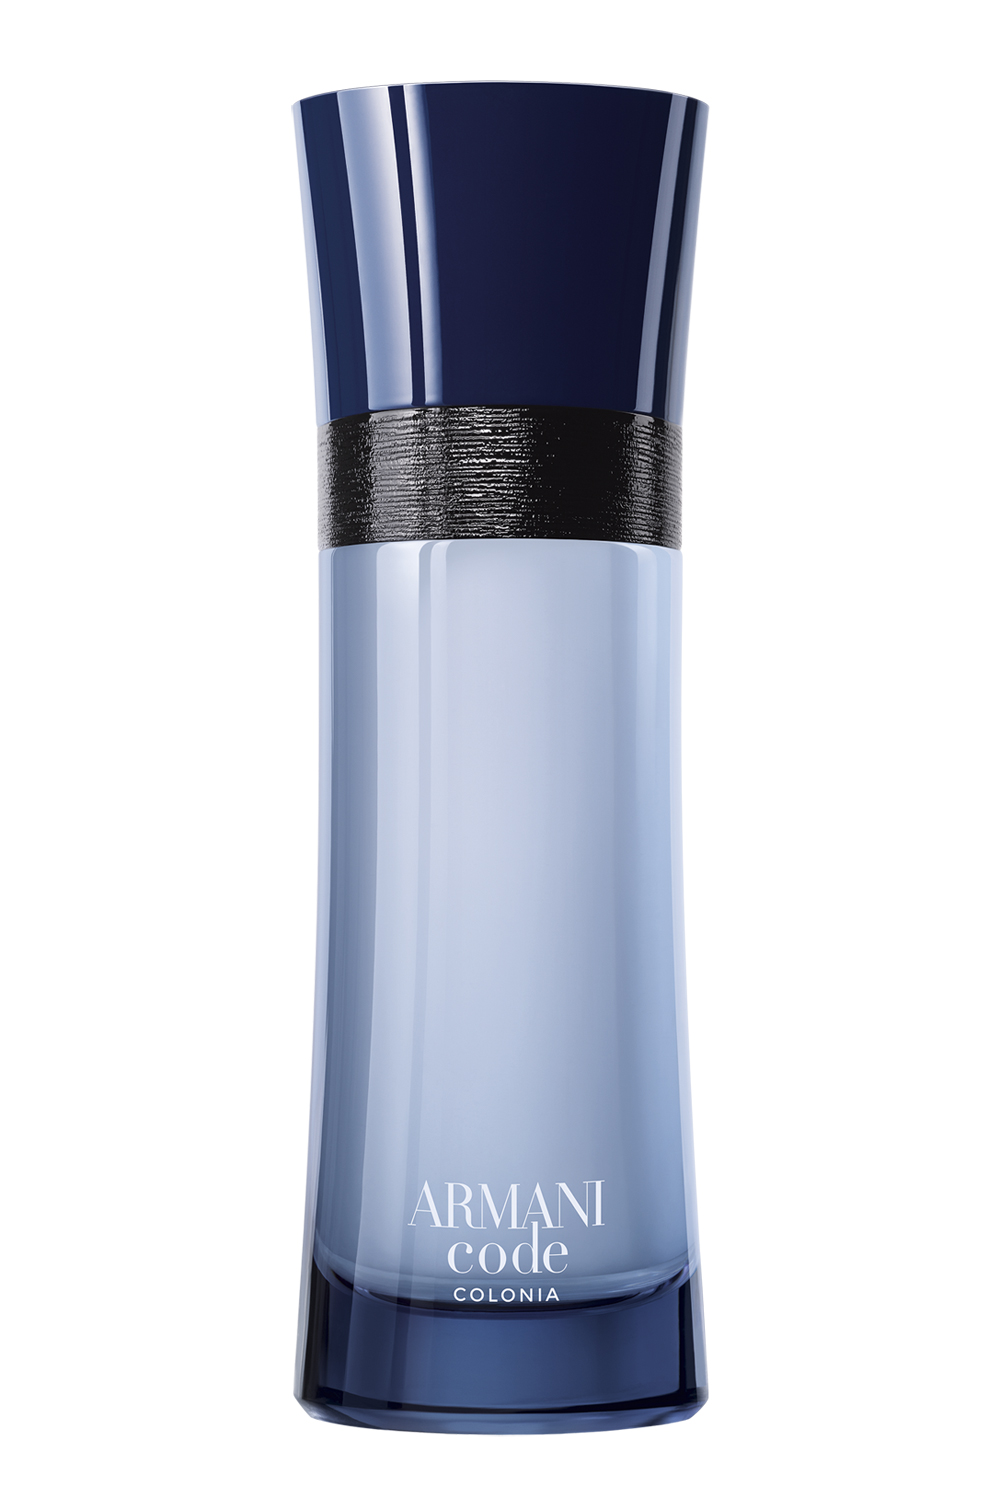 Giorgio Armani Men's Armani Code Eau de Toilette Spray 2.5 oz